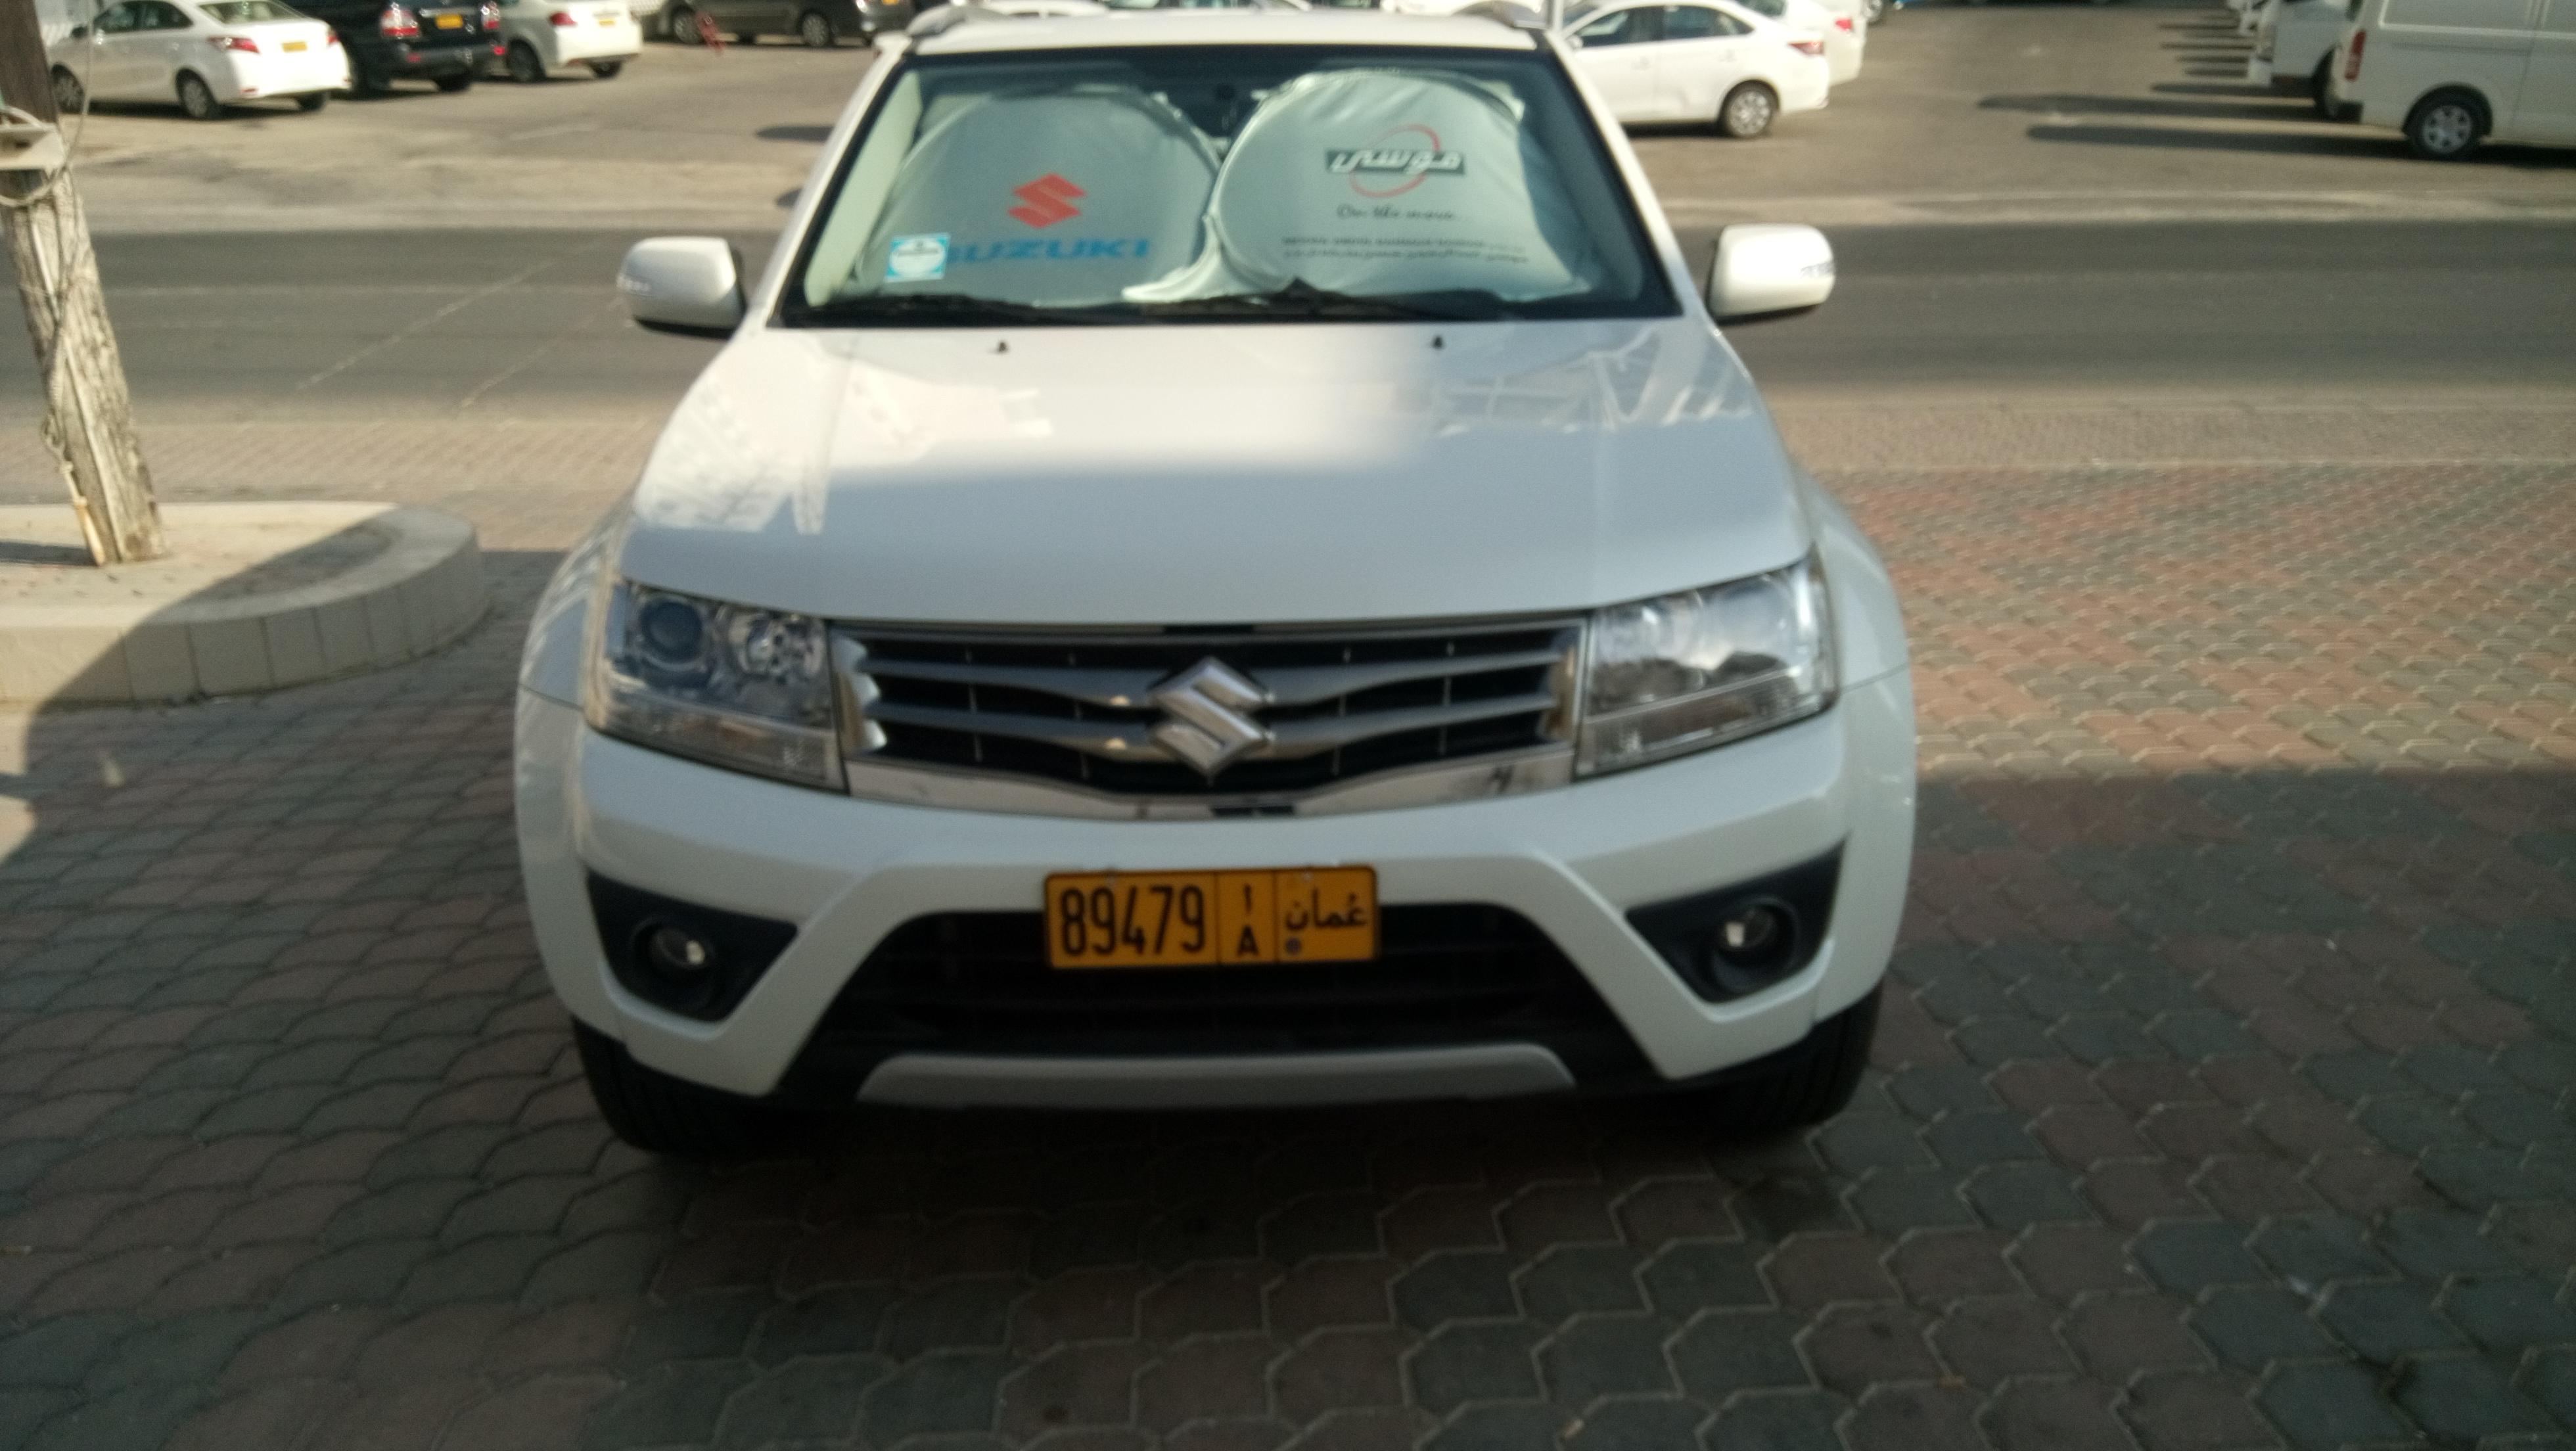 Used Suzuki Cars For Sale In Uae